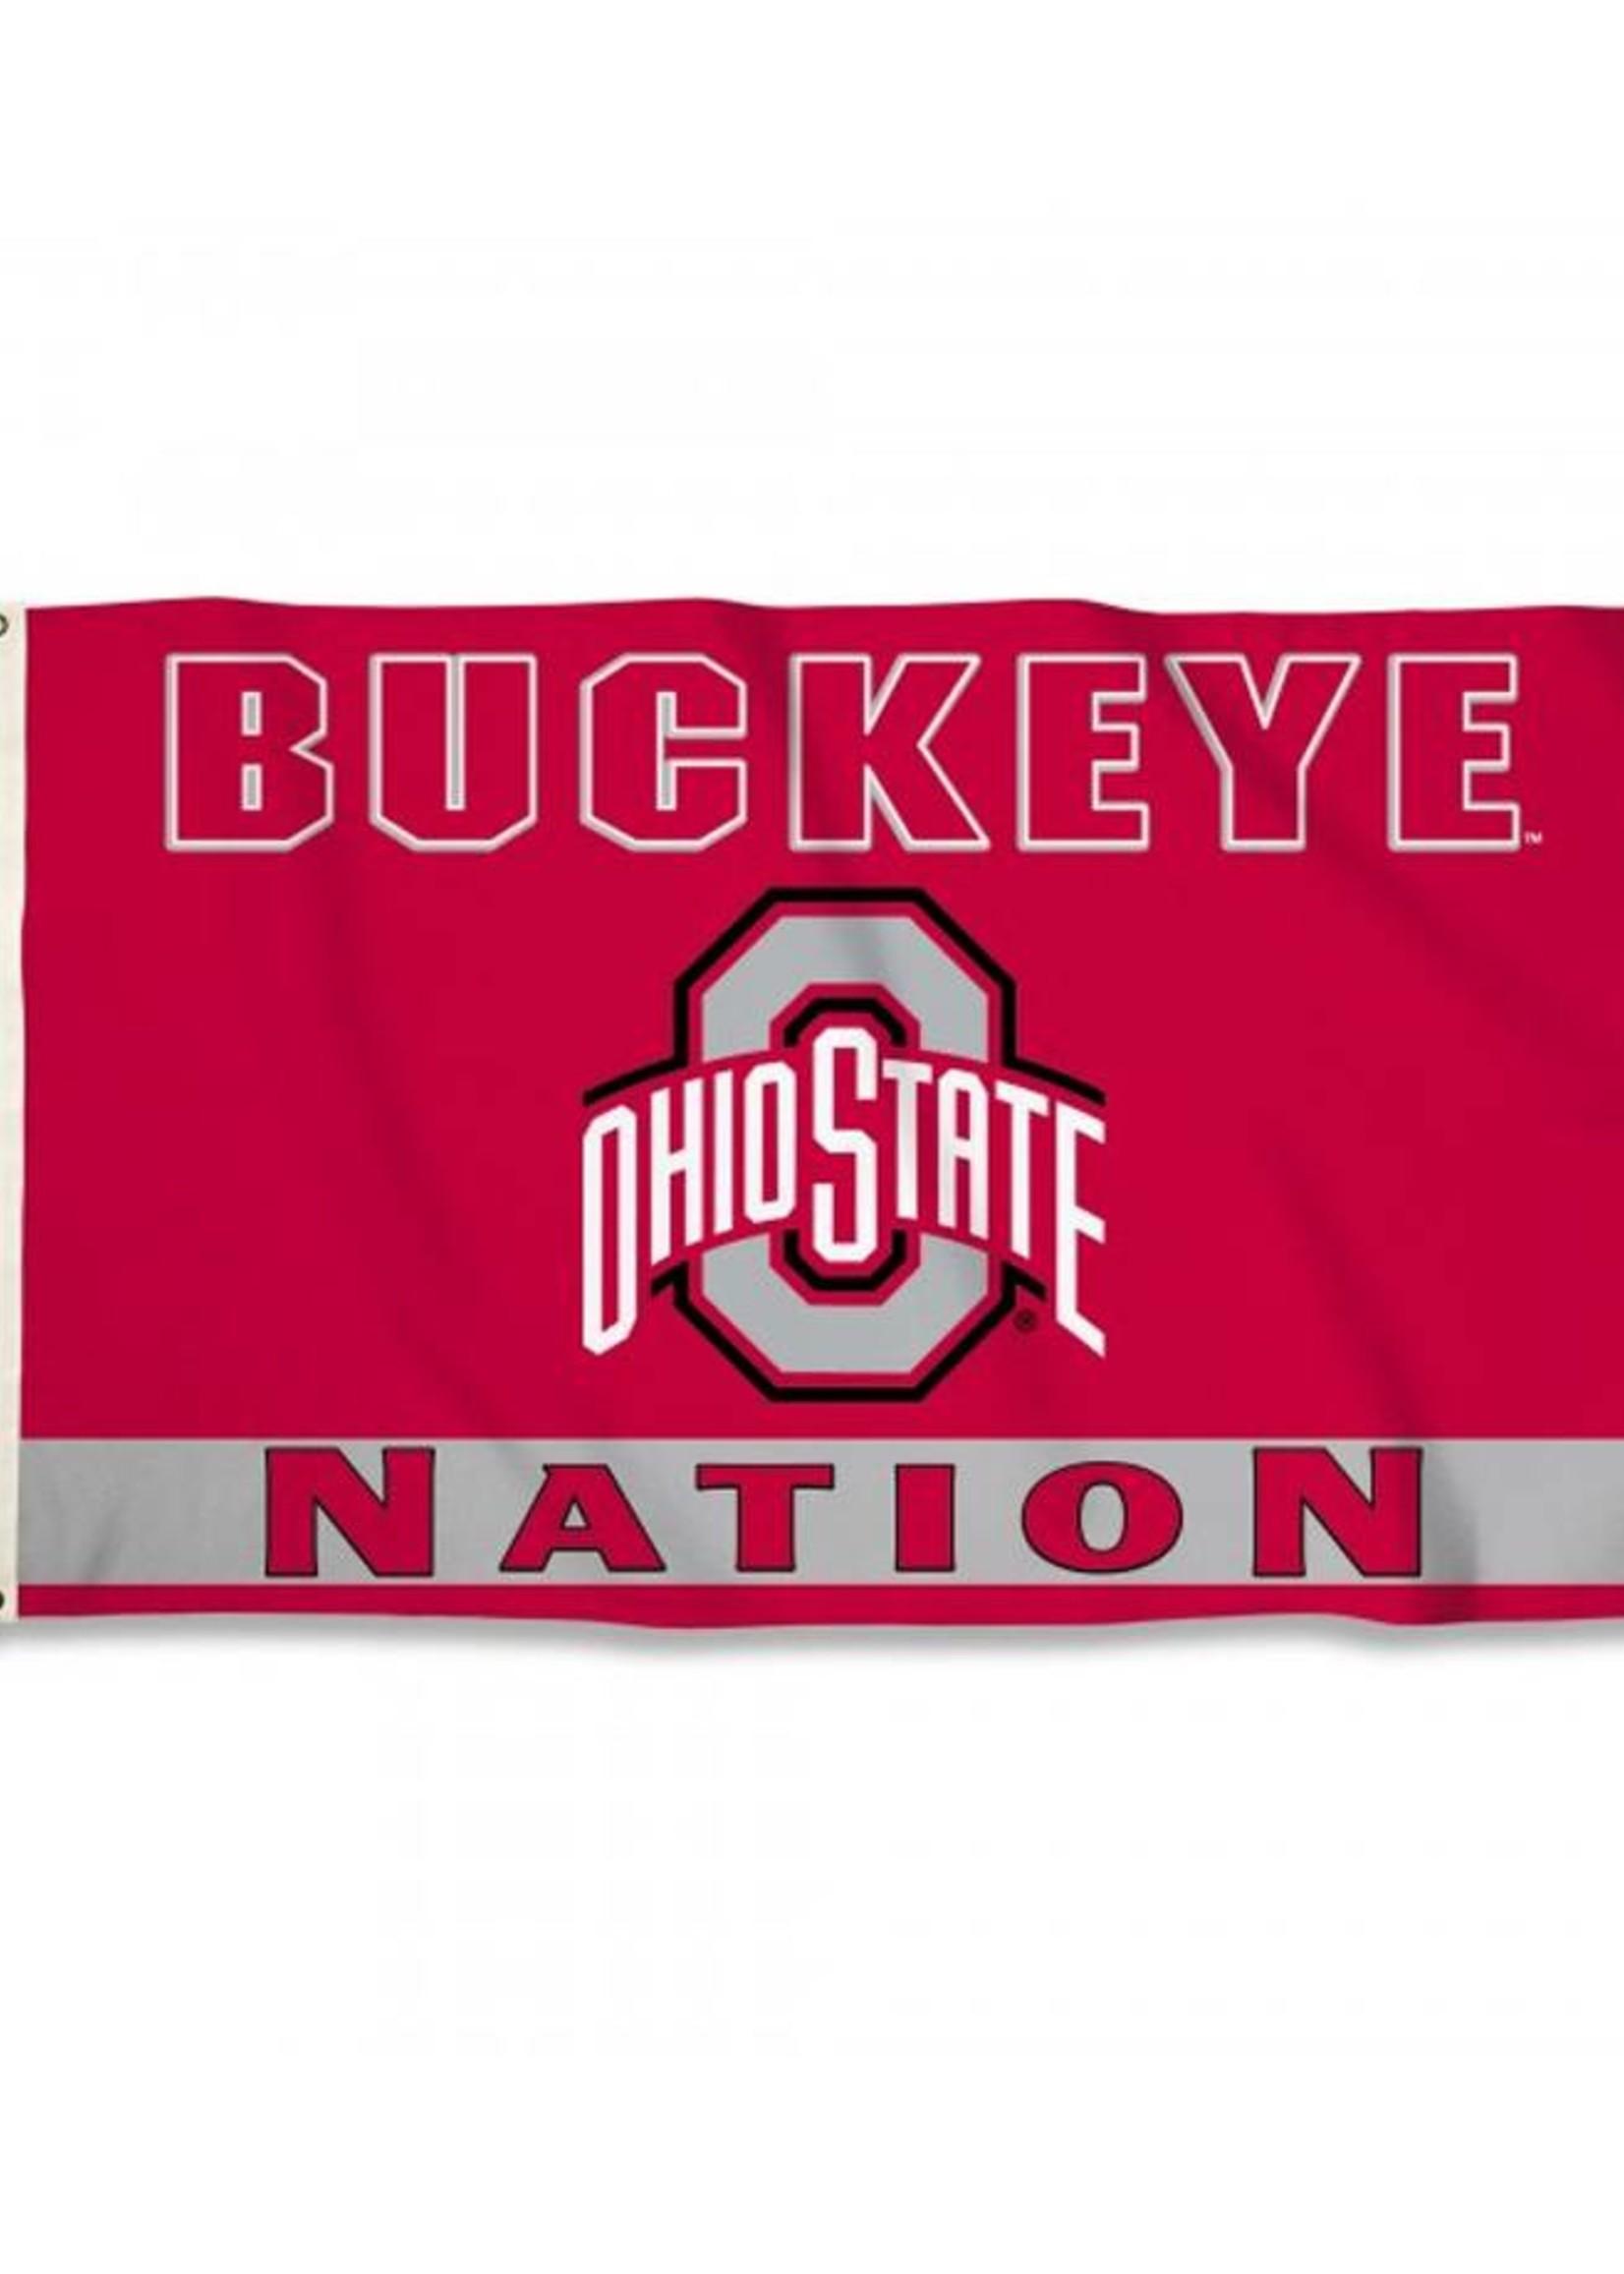 Ohio State Buckeye Nation 3x5 Premium Flag